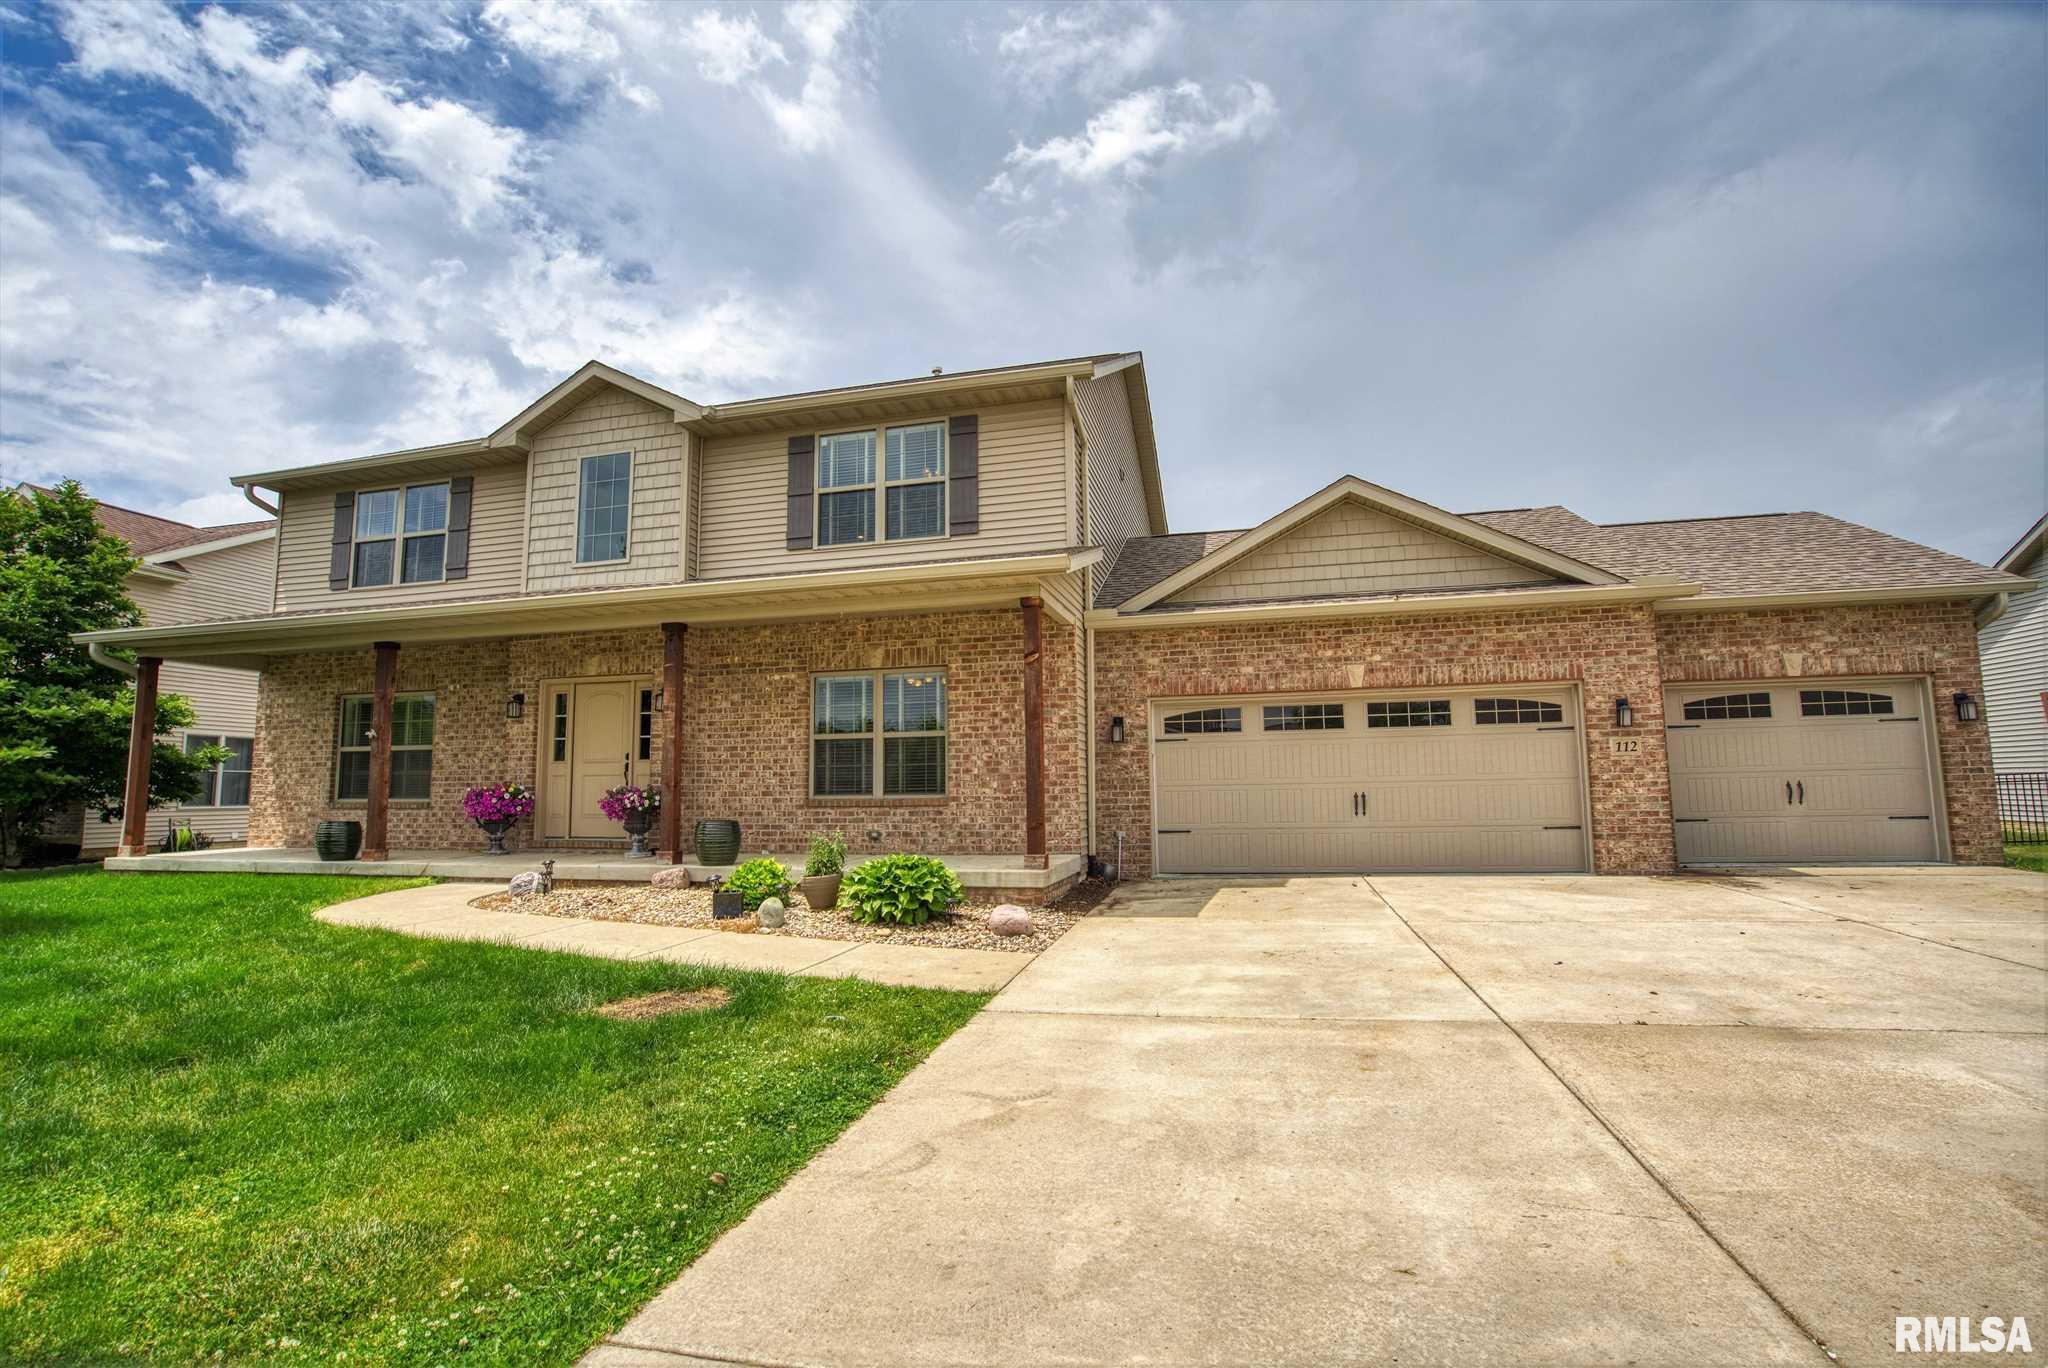 112 WHISTLING STRAIT Property Photo - Washington, IL real estate listing